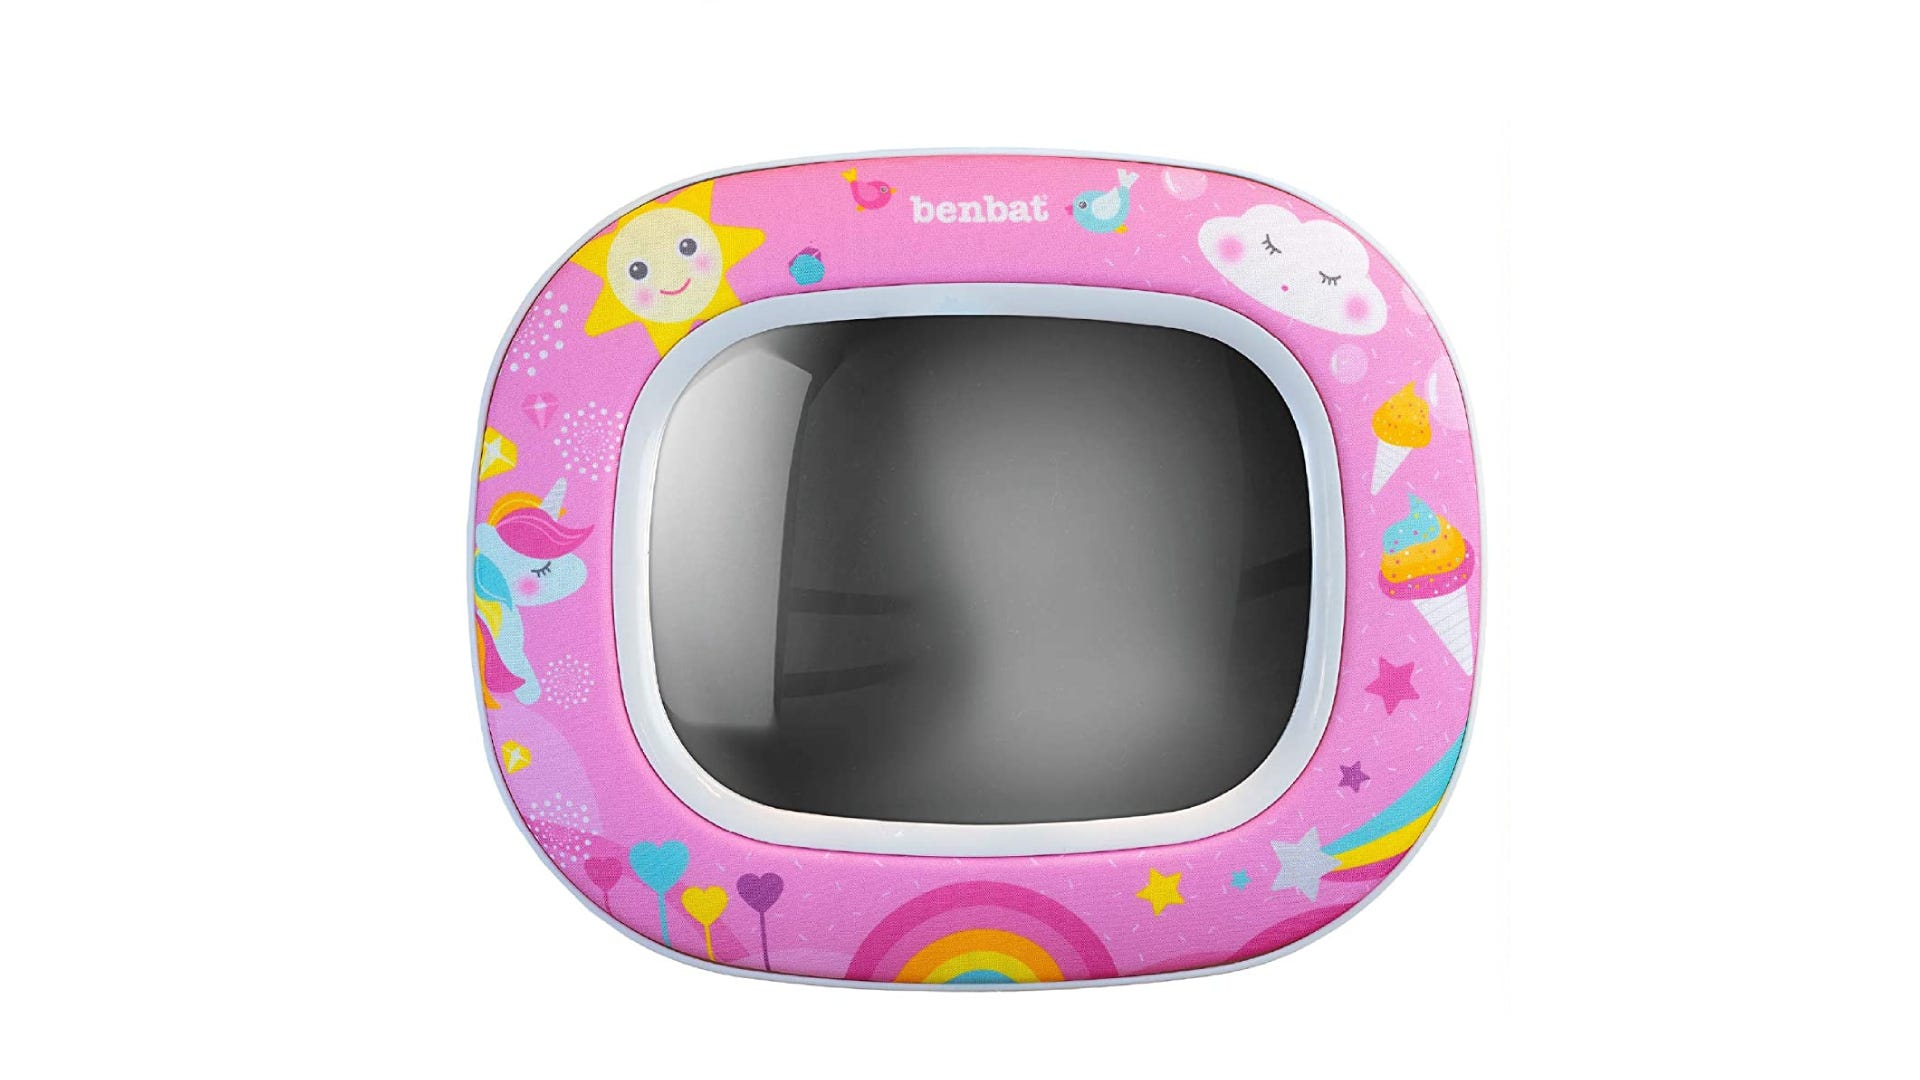 baby mirror with sun, rainbow, clouds, unicorn printed on the rim